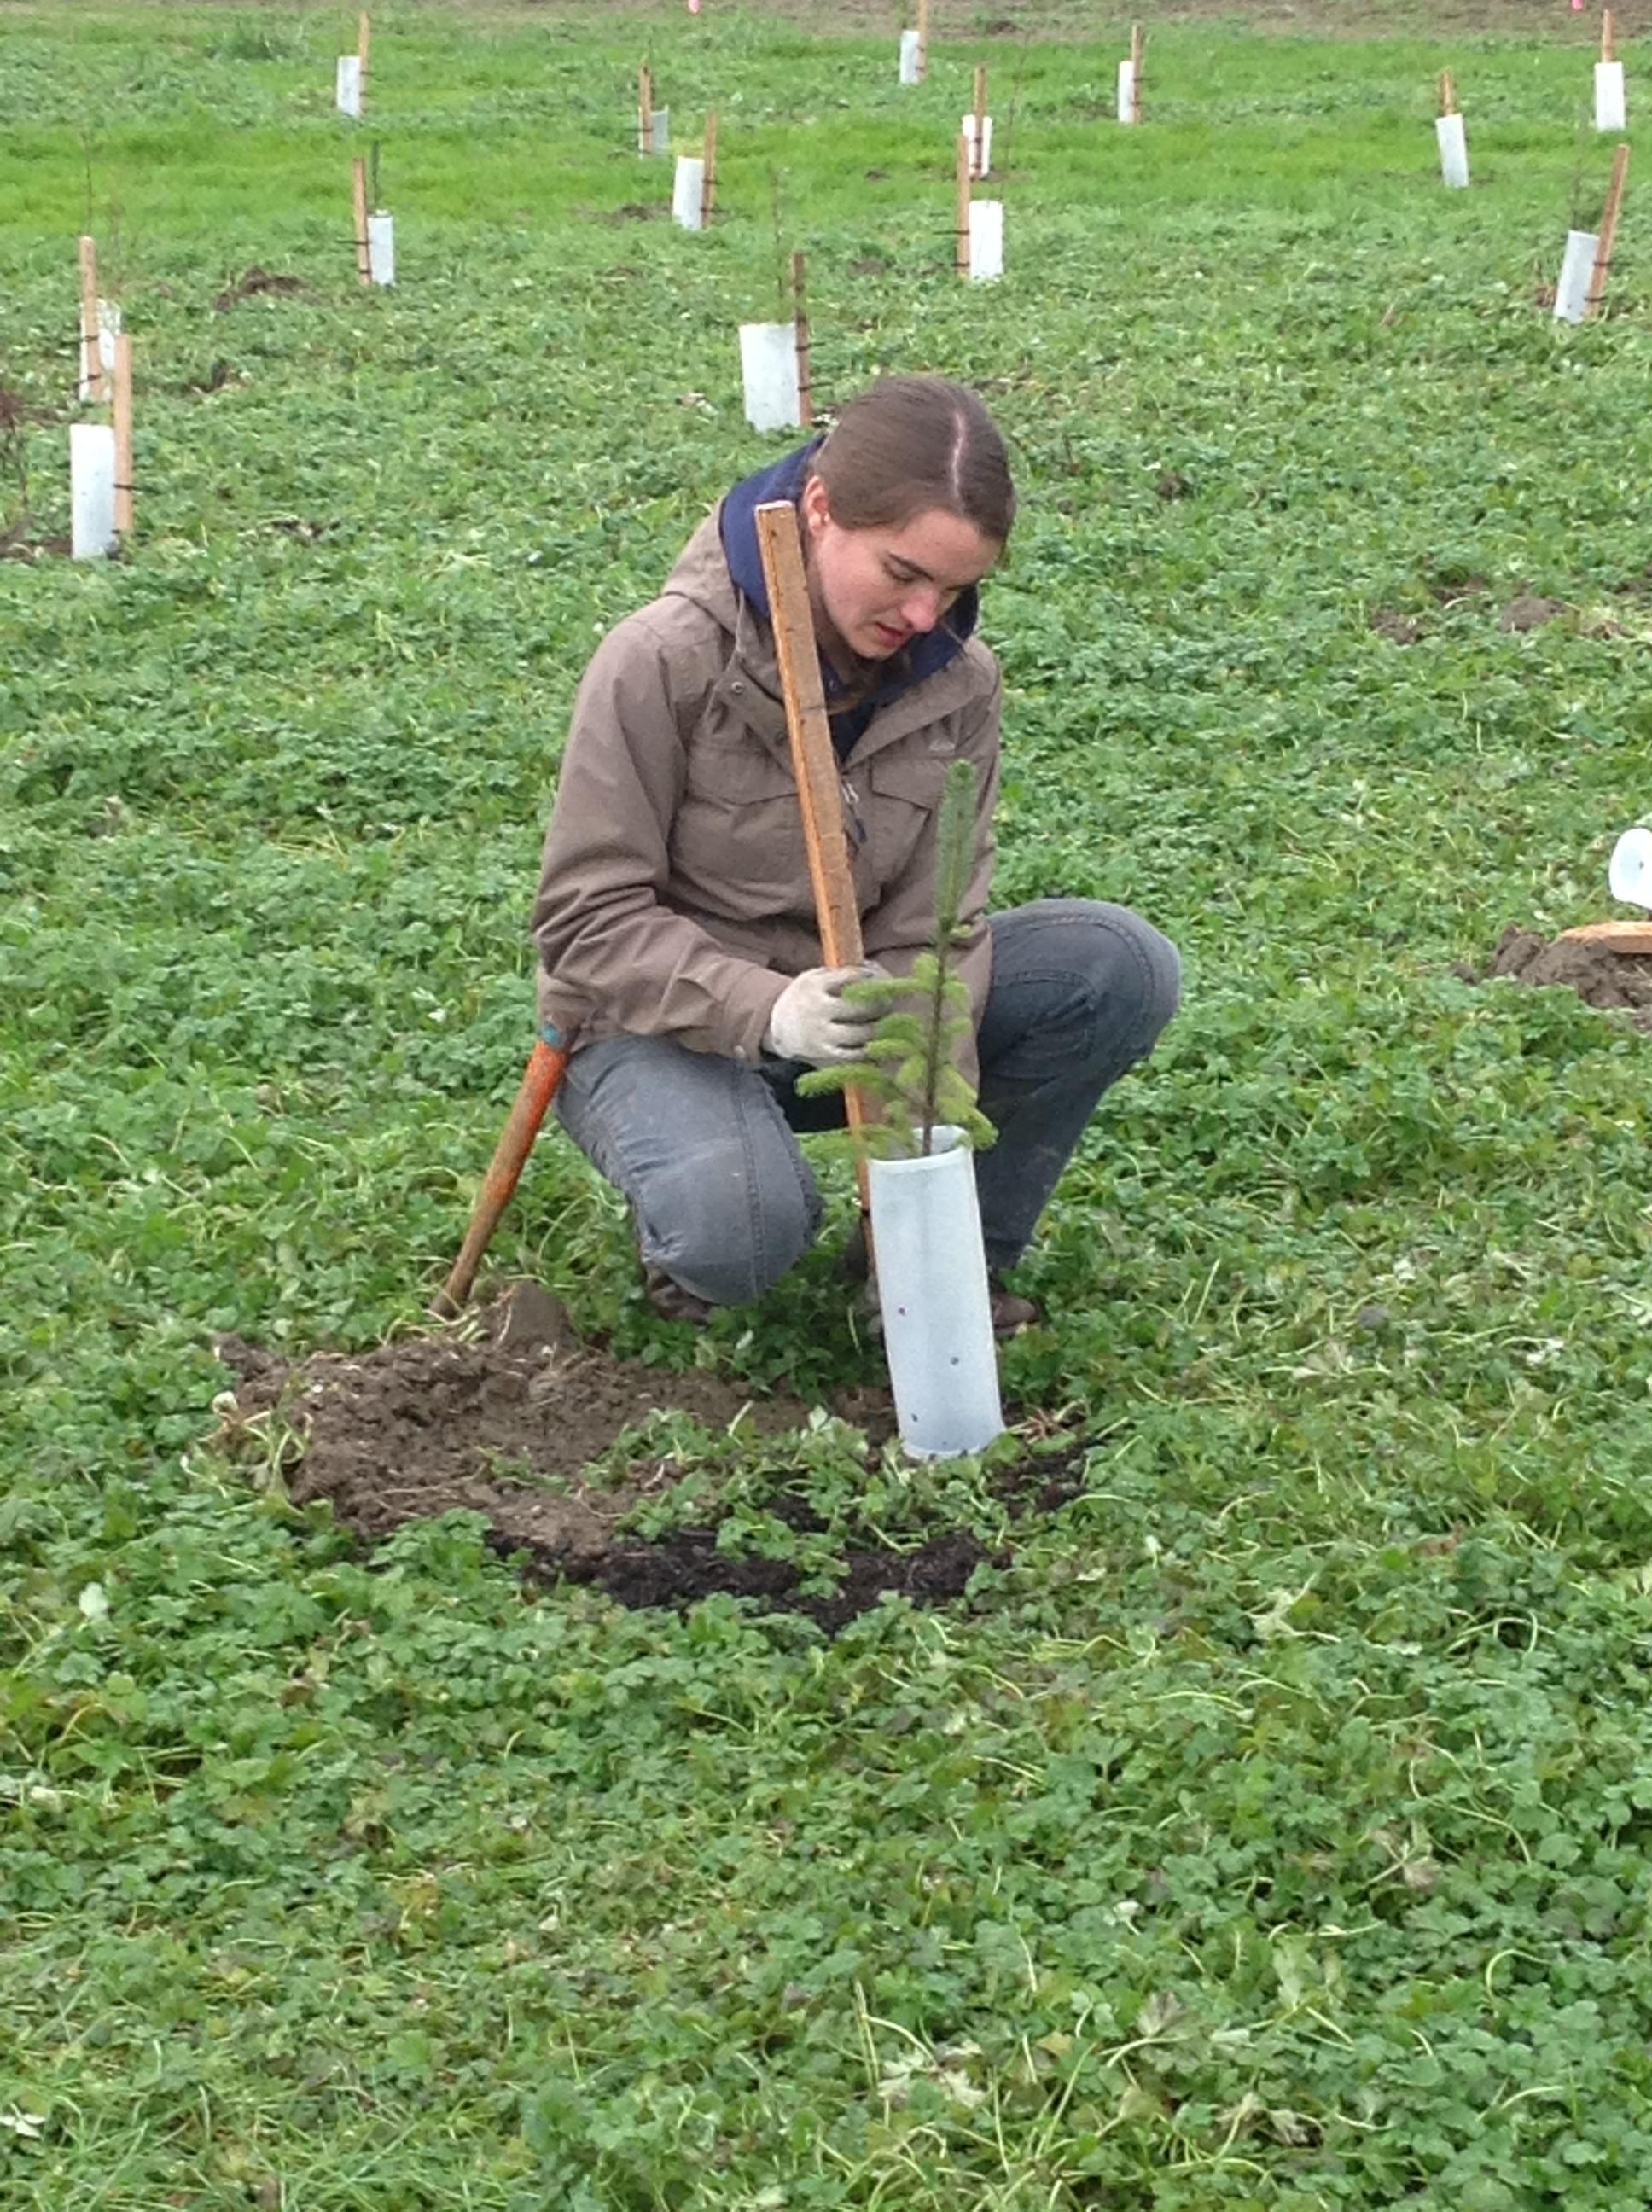 Roxanne planting a tree